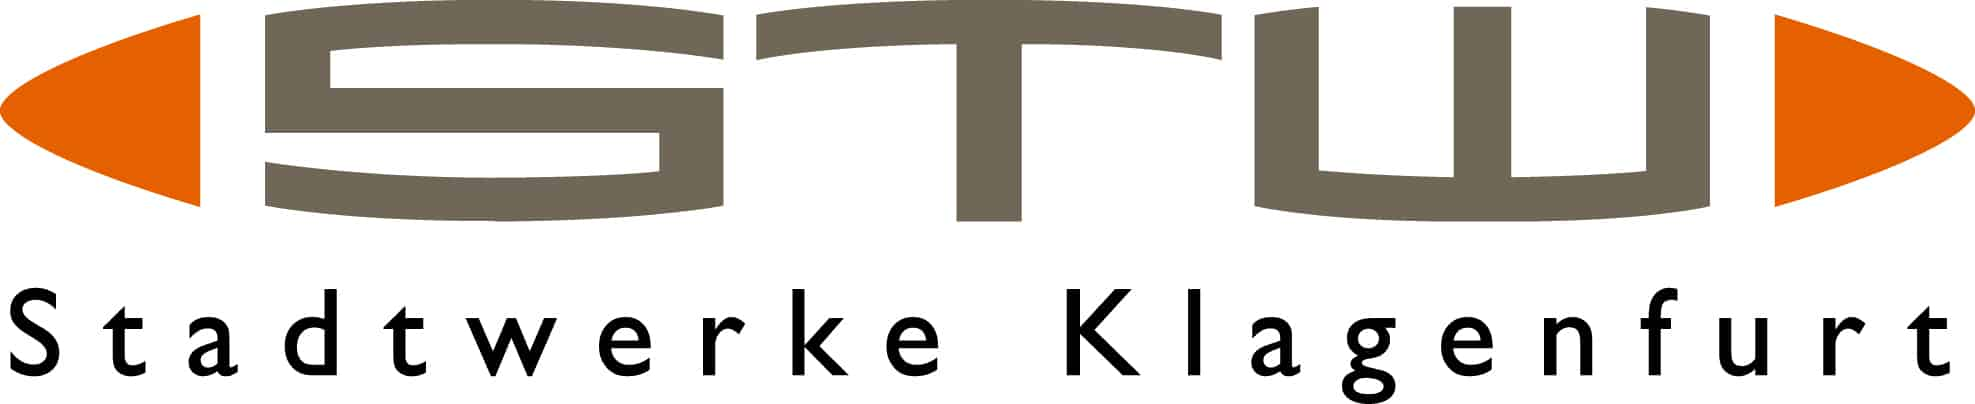 Logo van Stadtwerke Klagenfurt laadpas